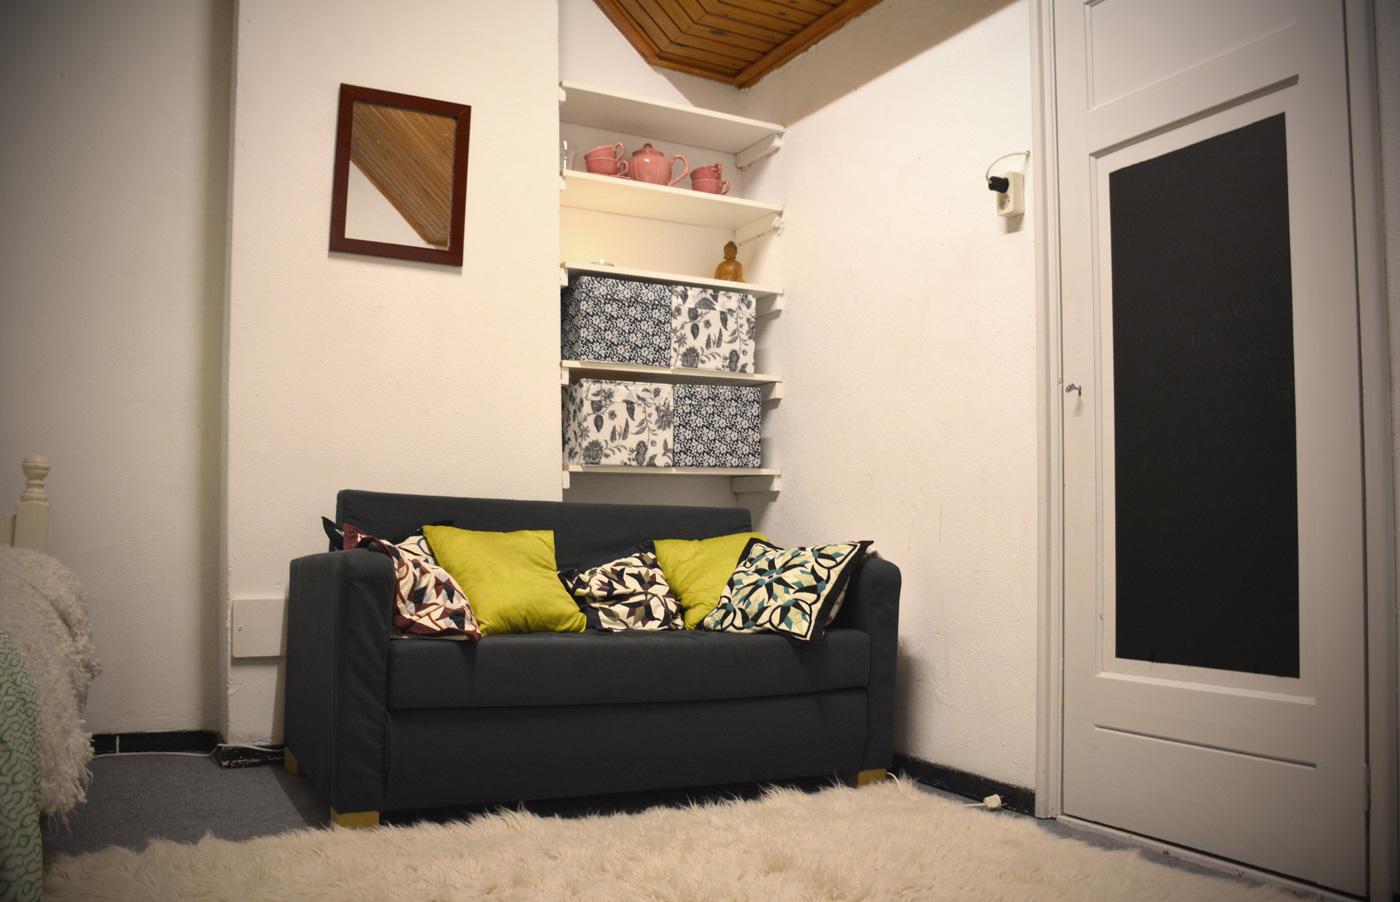 Goedkoop badkamer idees: goedkoop slaapkamer idees inrichten brocante.